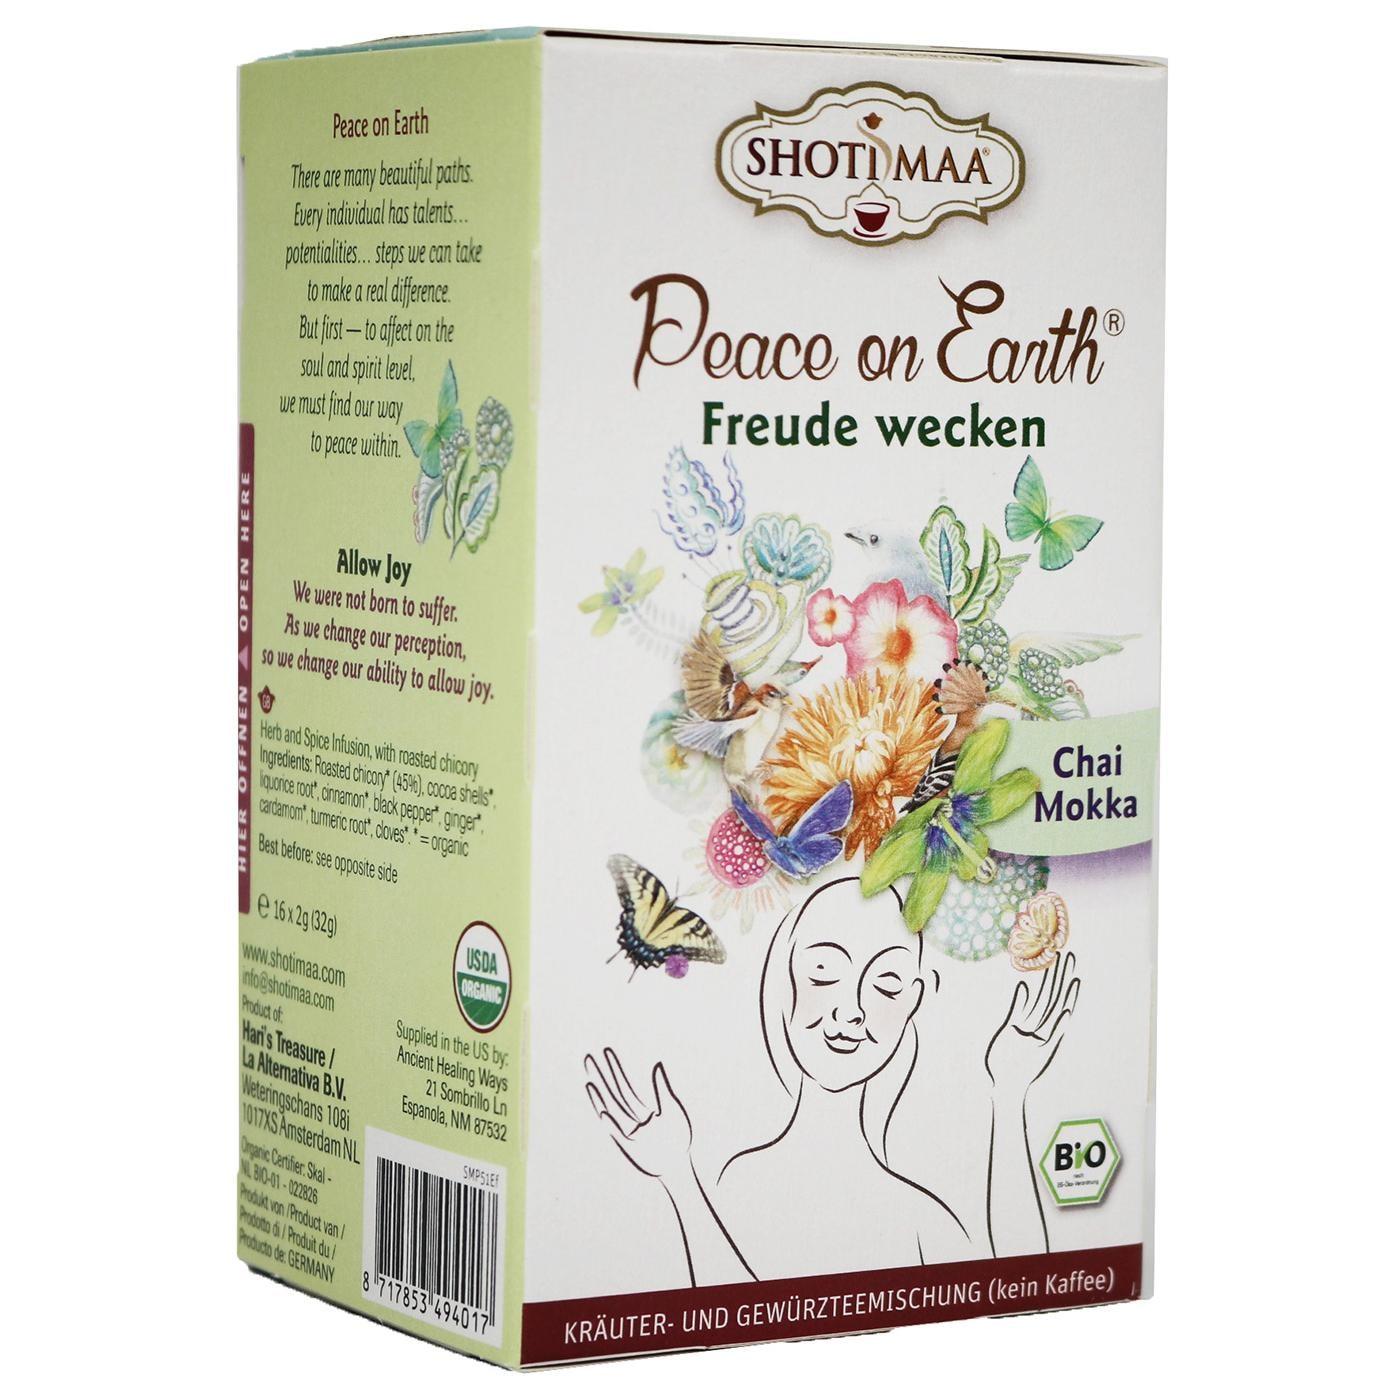 "Hari Tea Bio Peace on Earth Teemischung ""Freude wecken"" Chai Mokka 32g"